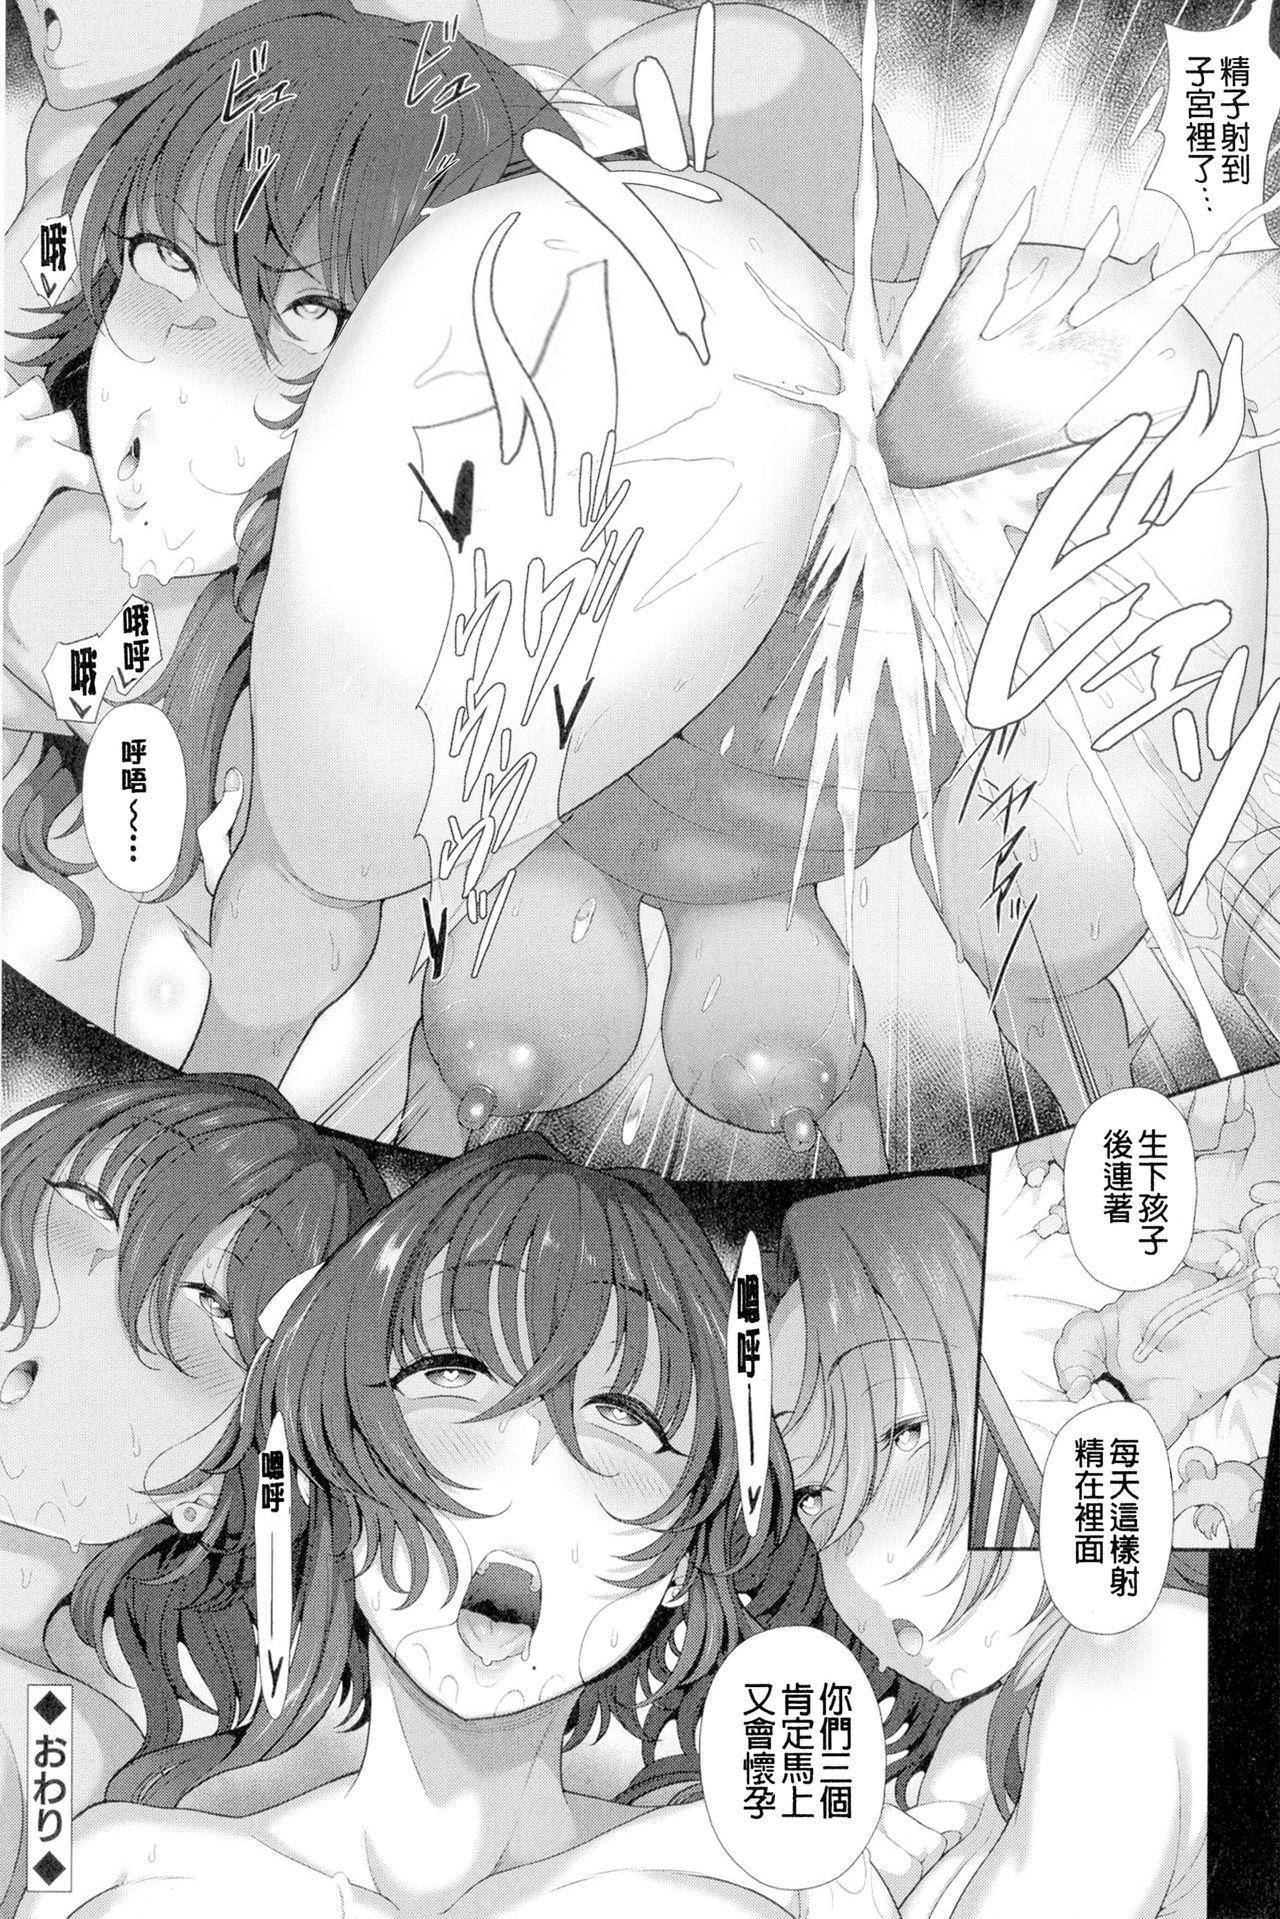 Juku Mesu - Erotic Mature Women 216